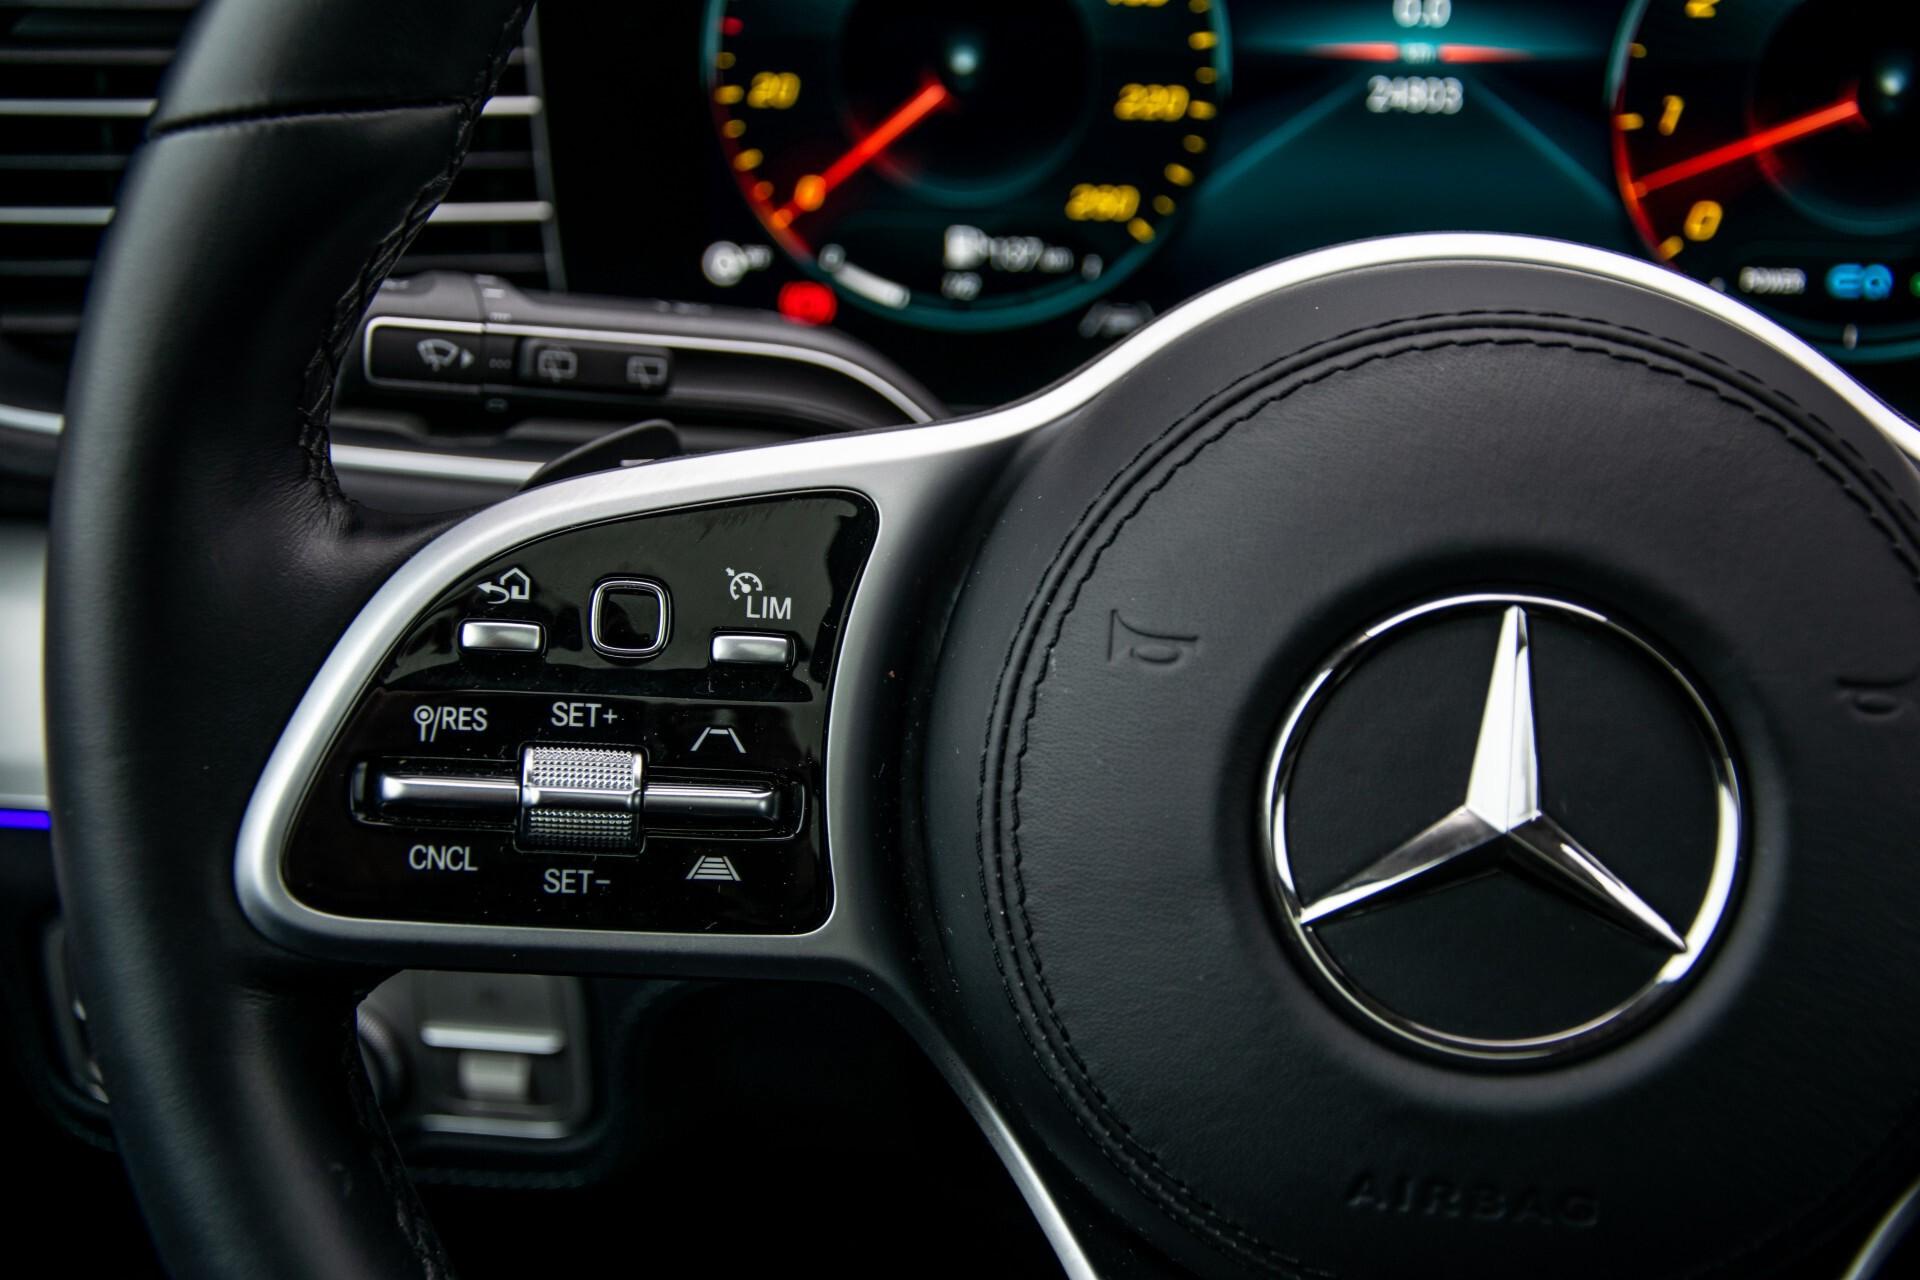 Mercedes-Benz GLE 450 4-M 7-Persoons AMG Massage/Rij-assist/Keyless/TV/360/Night/Trekhaak Aut9 Foto 11